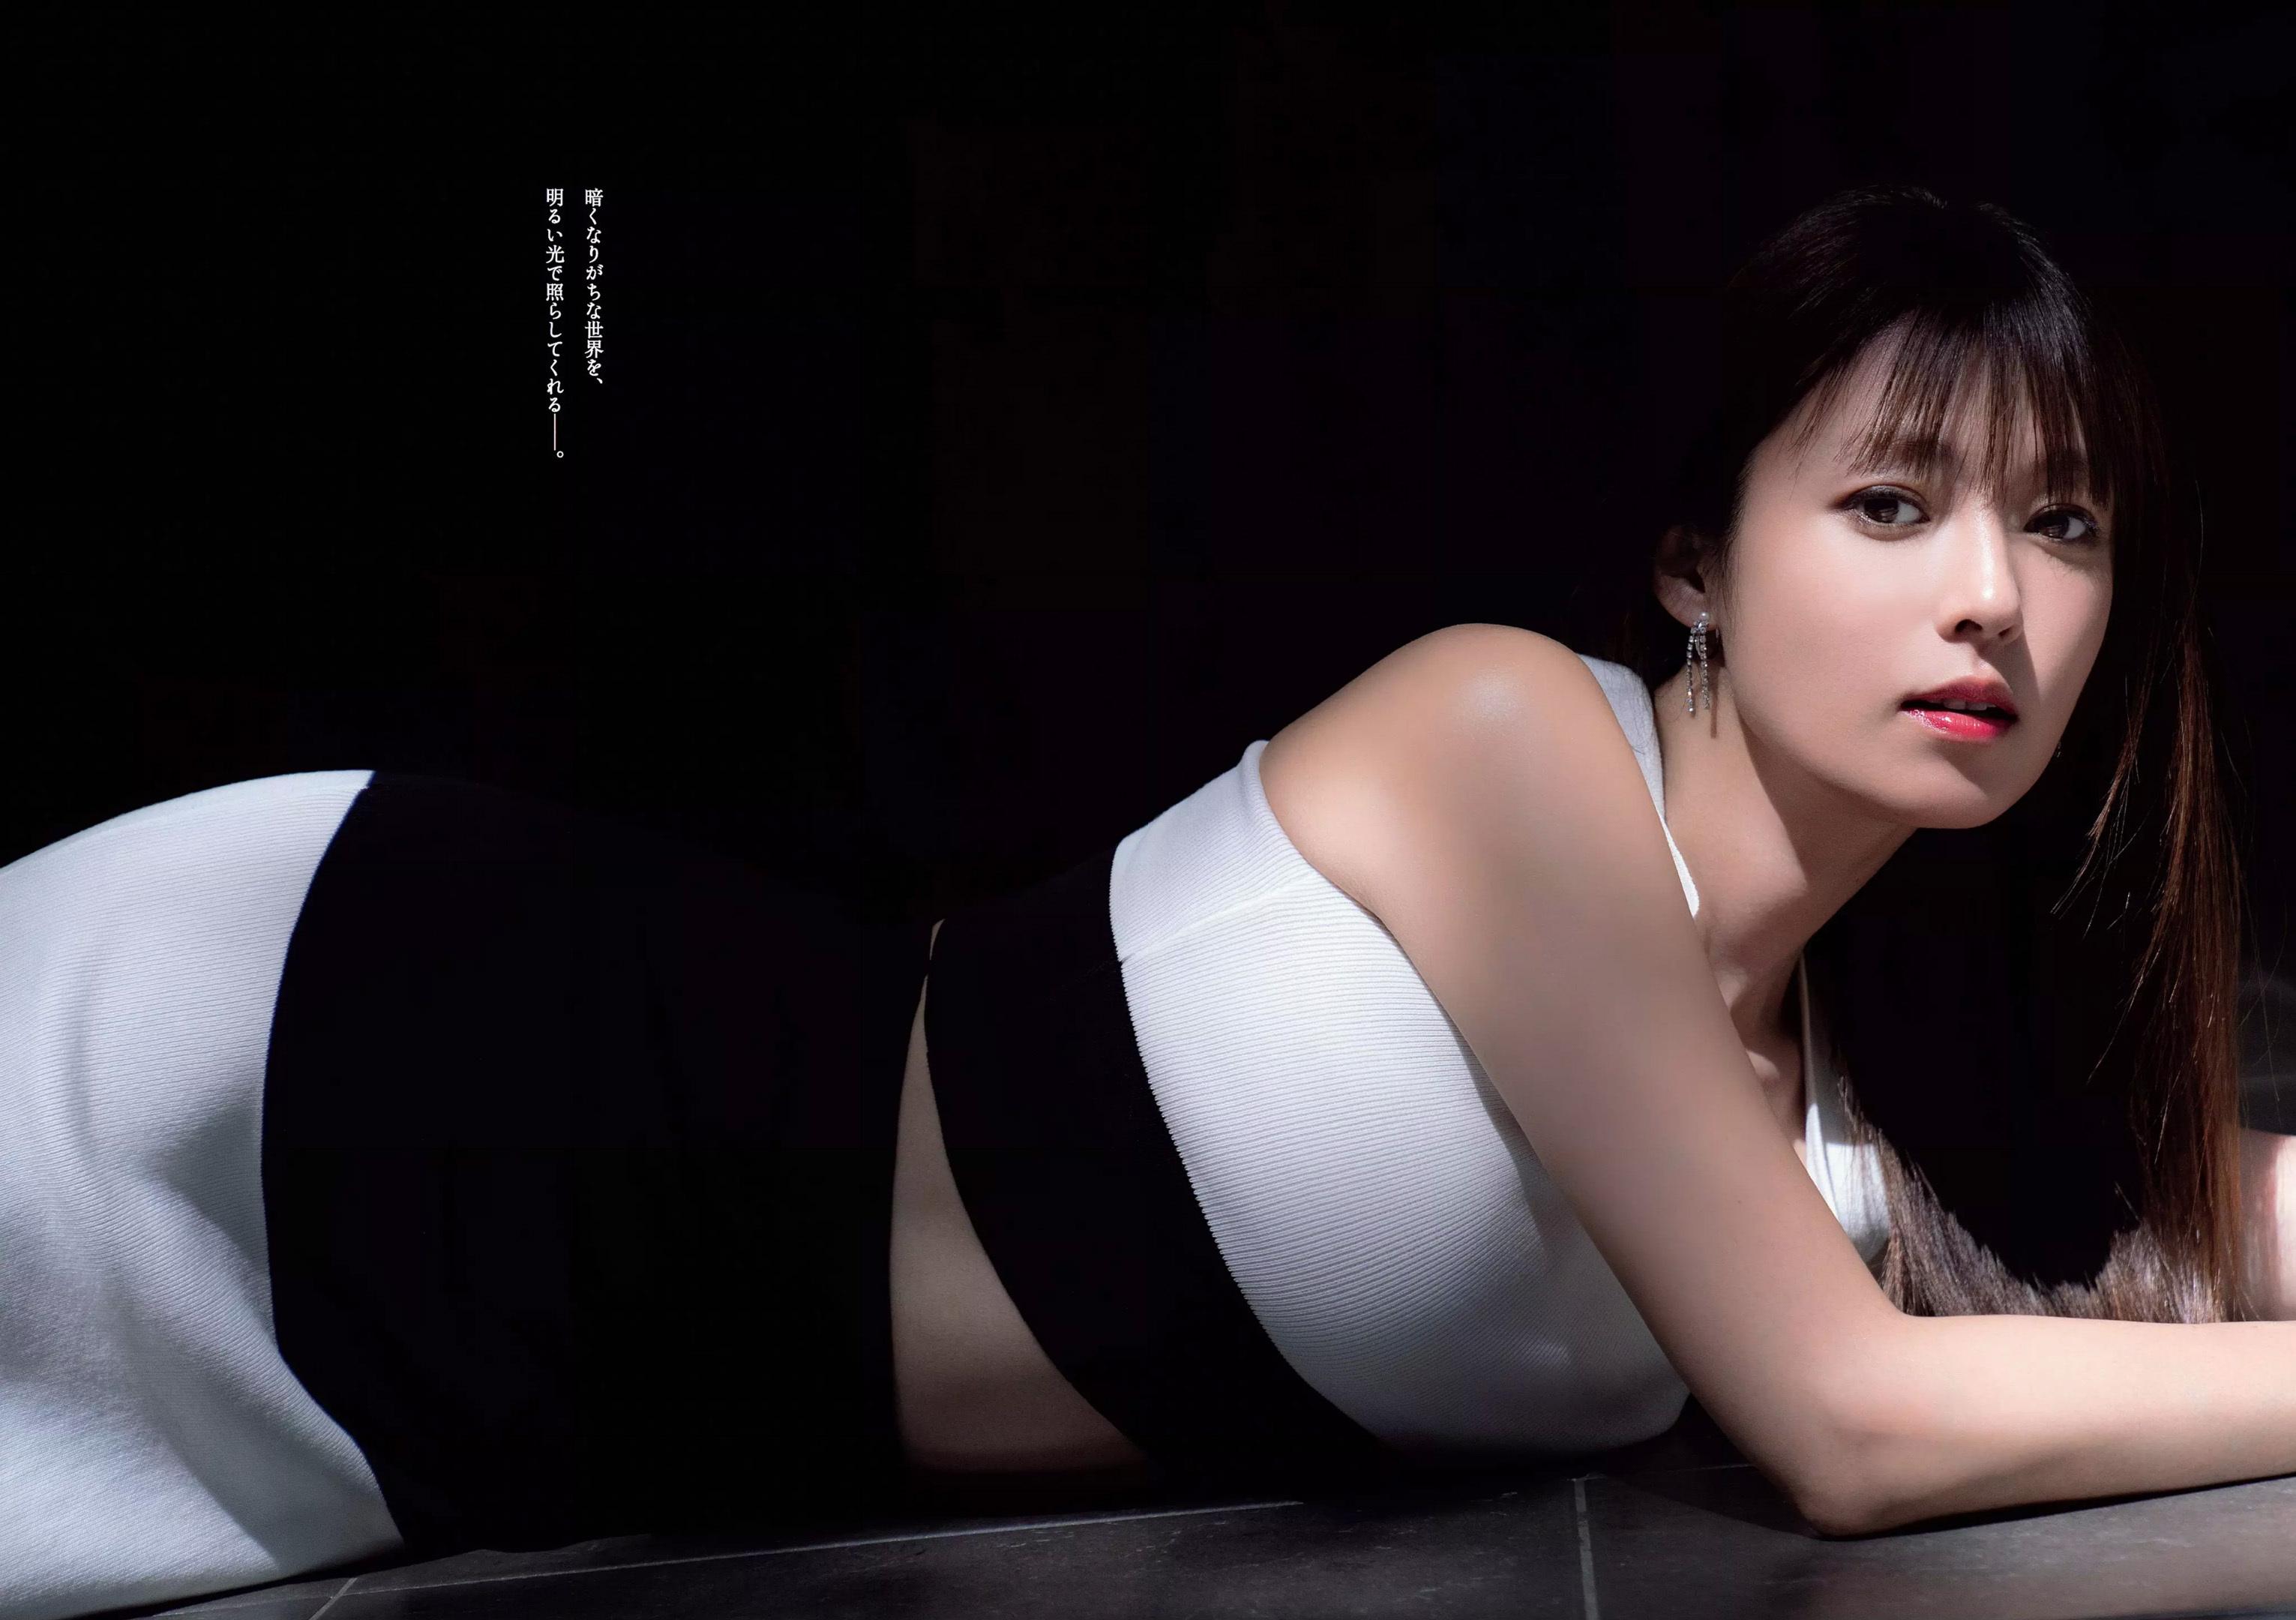 深田恭子 Weekly Playboy